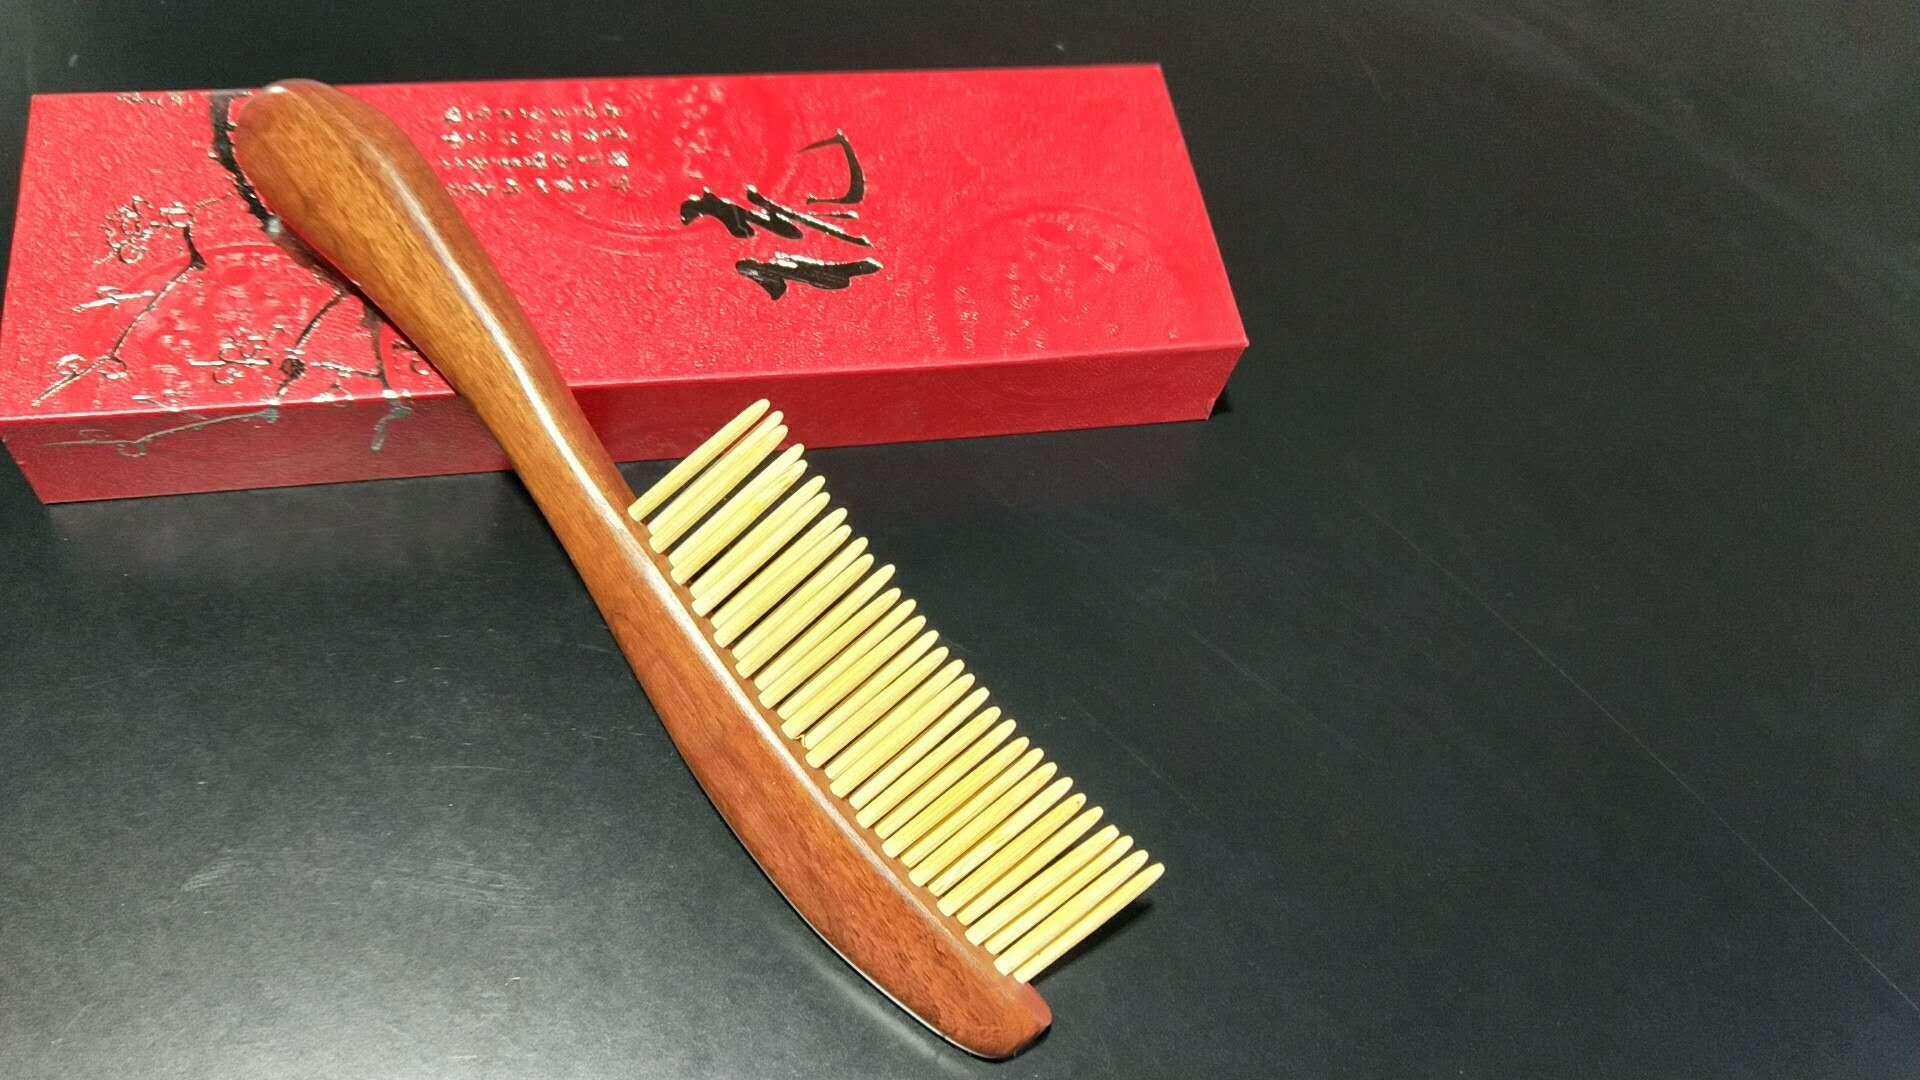 1PC Natural Sandalwood Bamboo Hair Comb Anti-Static Wooden Handle Hair Scalp Massage Comb Hairbrush Detangle Hair Brush Styling Tool